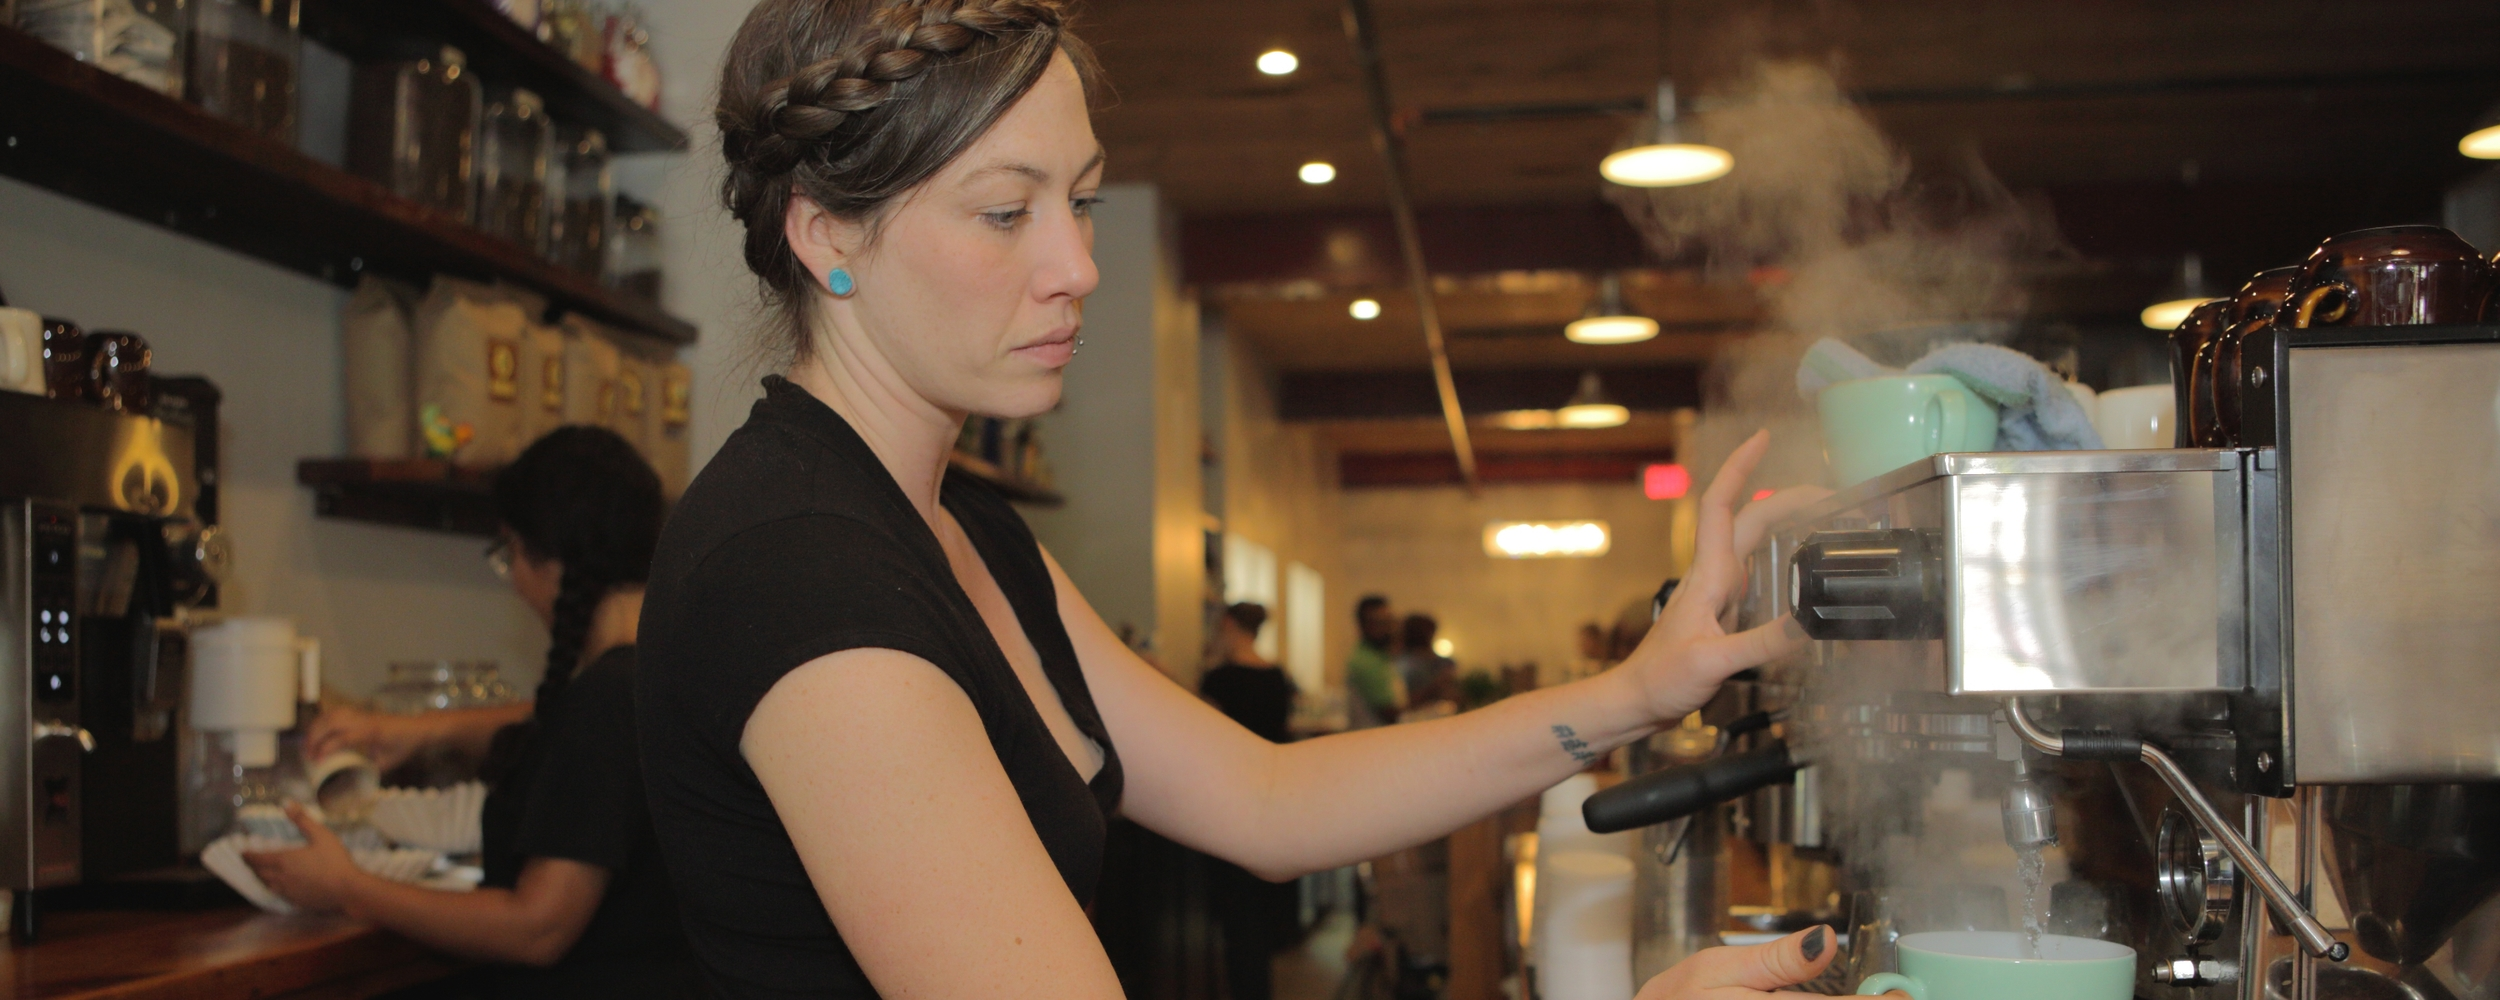 Making espresso. Photo: Jane Kortright.